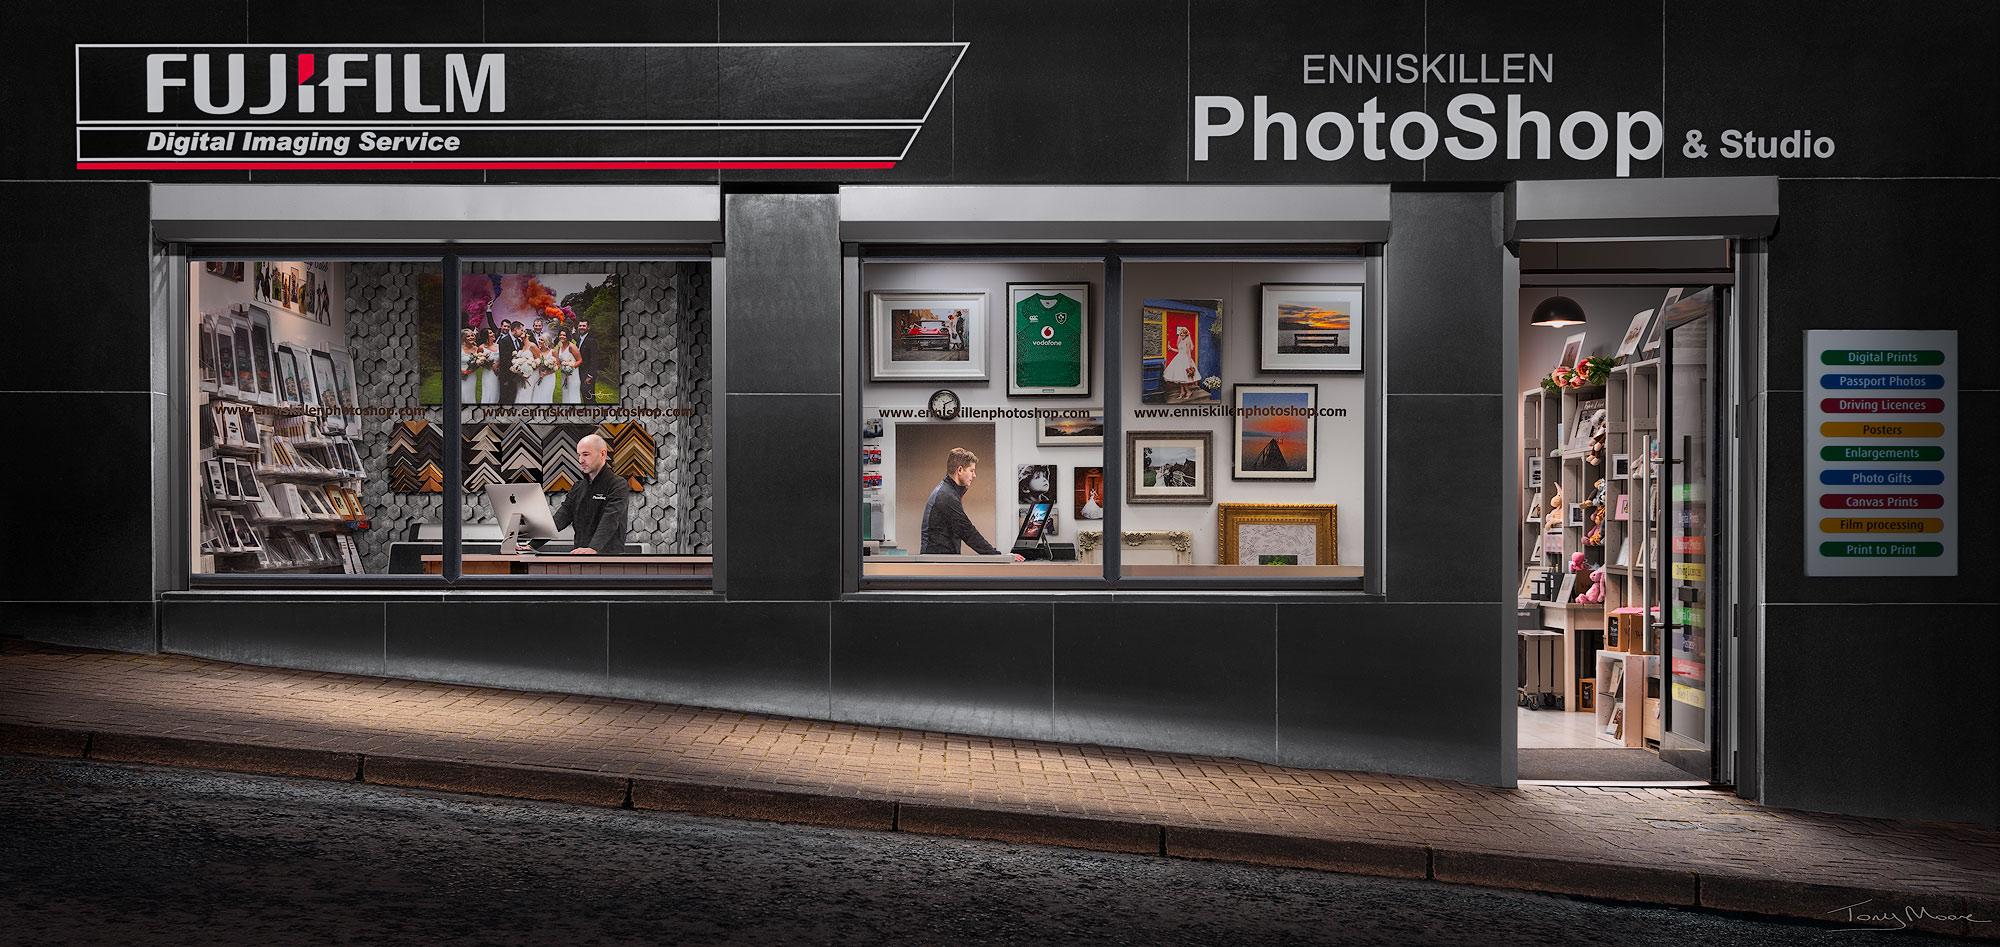 The Enniskillen PhotoShop Portrait by Tony Moore Photographer